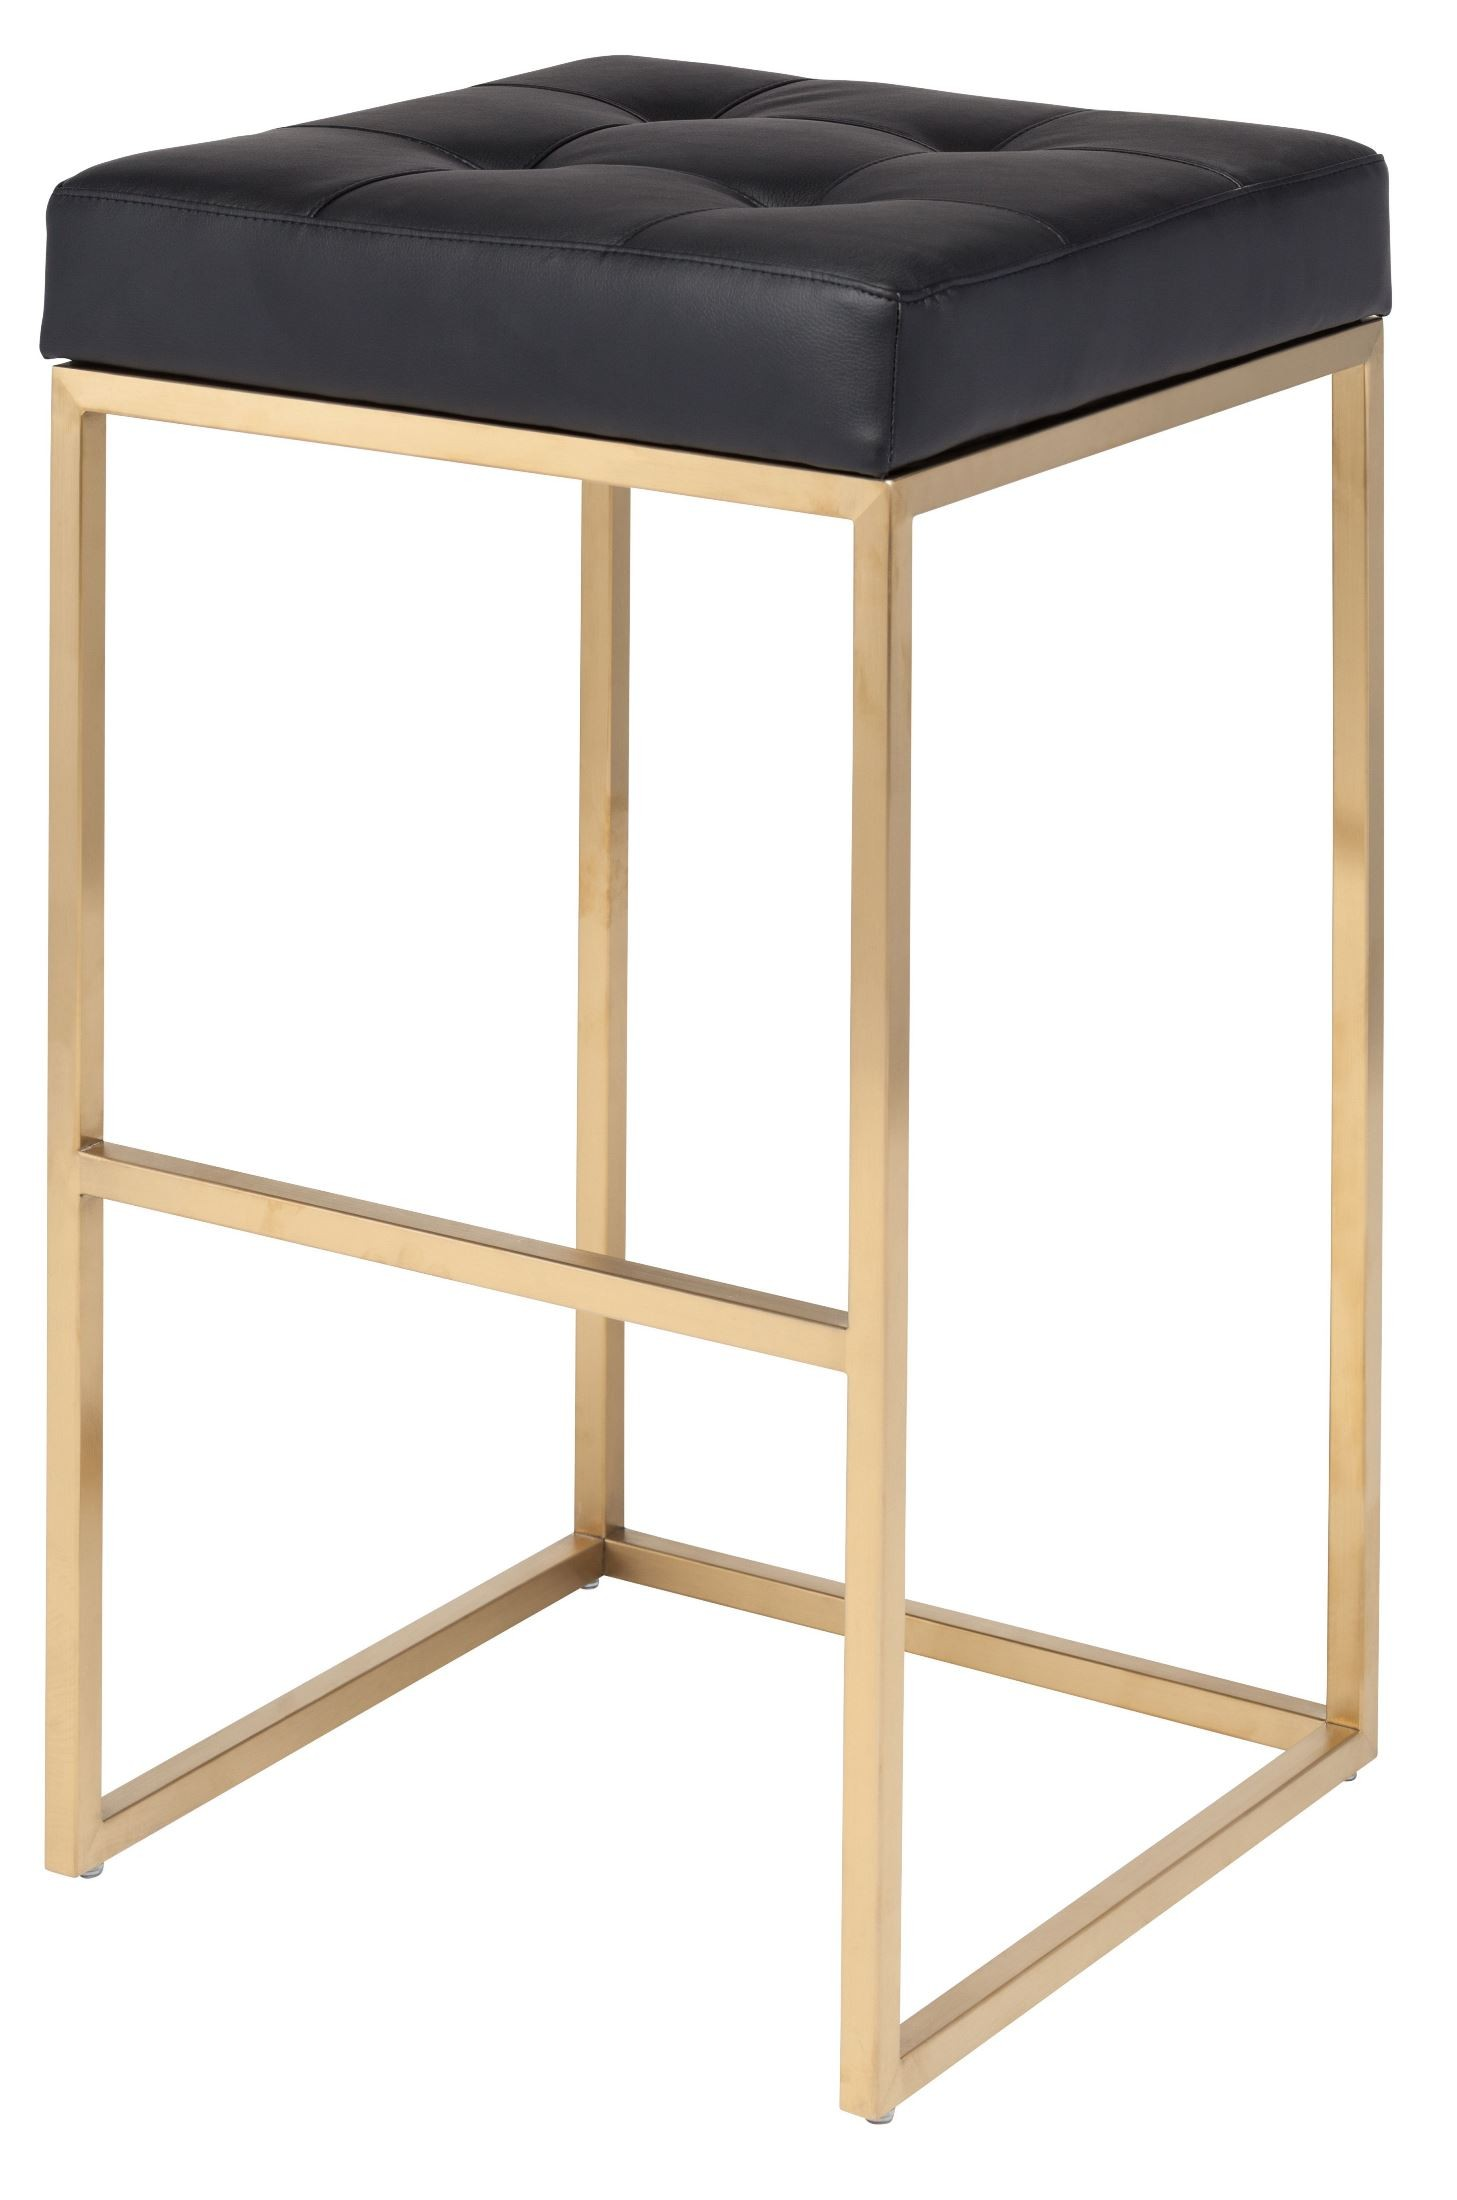 Chi Black Naugahyde Bar Stool From Nuevo Coleman Furniture